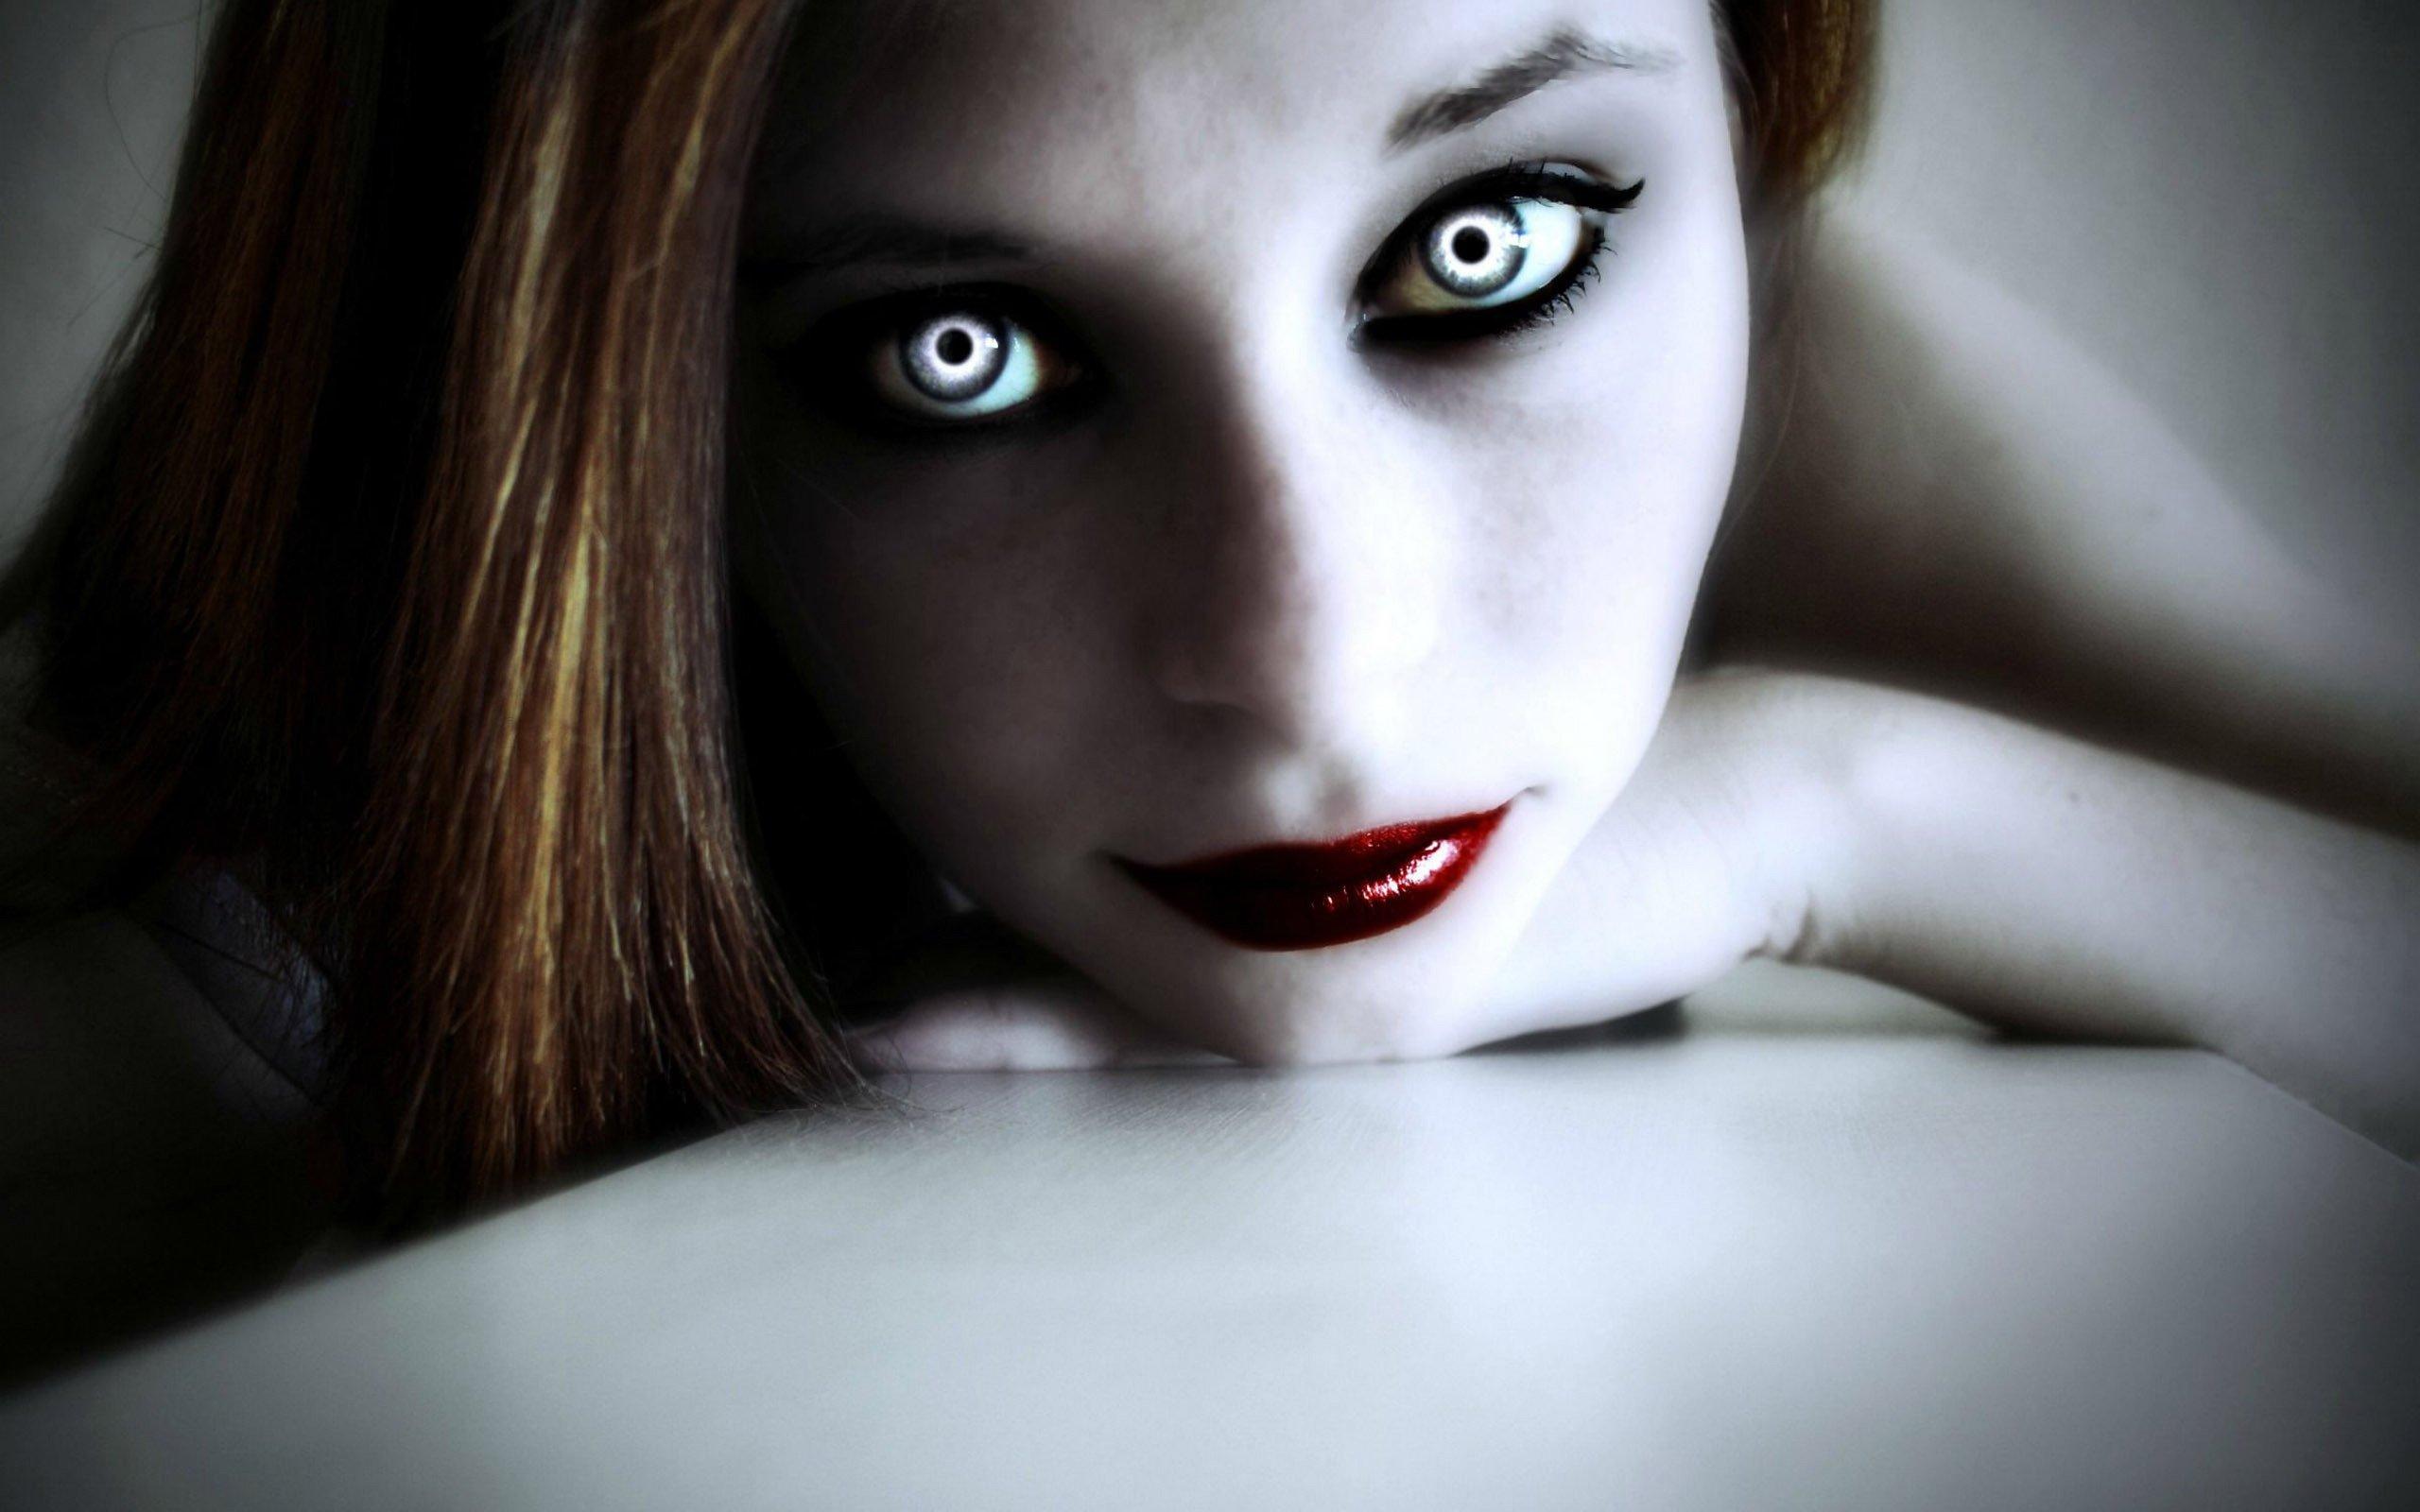 Gothic Vampire Wallpaper, HD Vampire ...